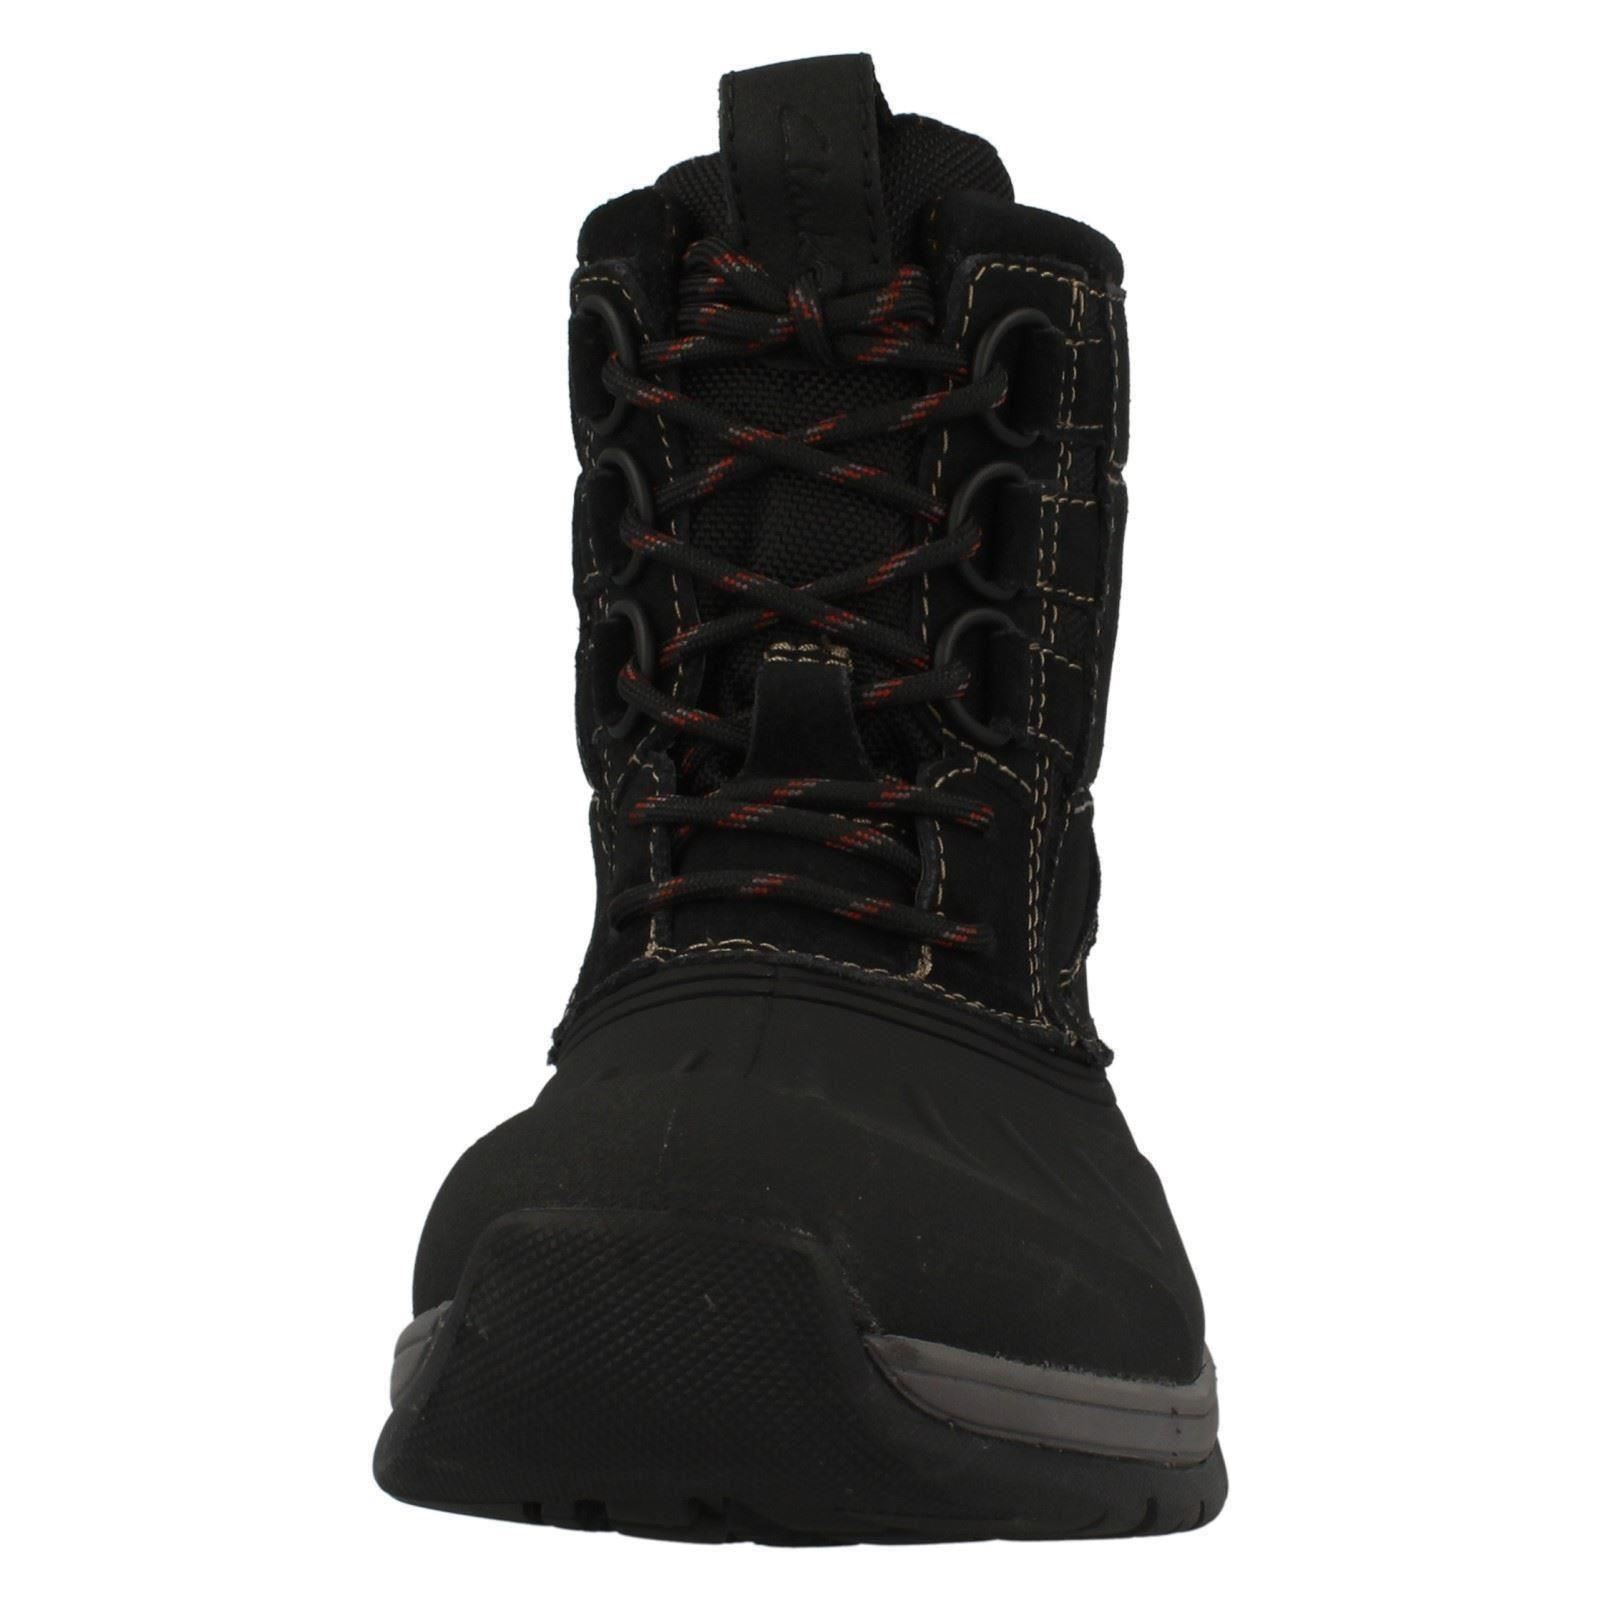 Mens-Clarks-Outdoor-Boots-Nashoba-Summit thumbnail 9